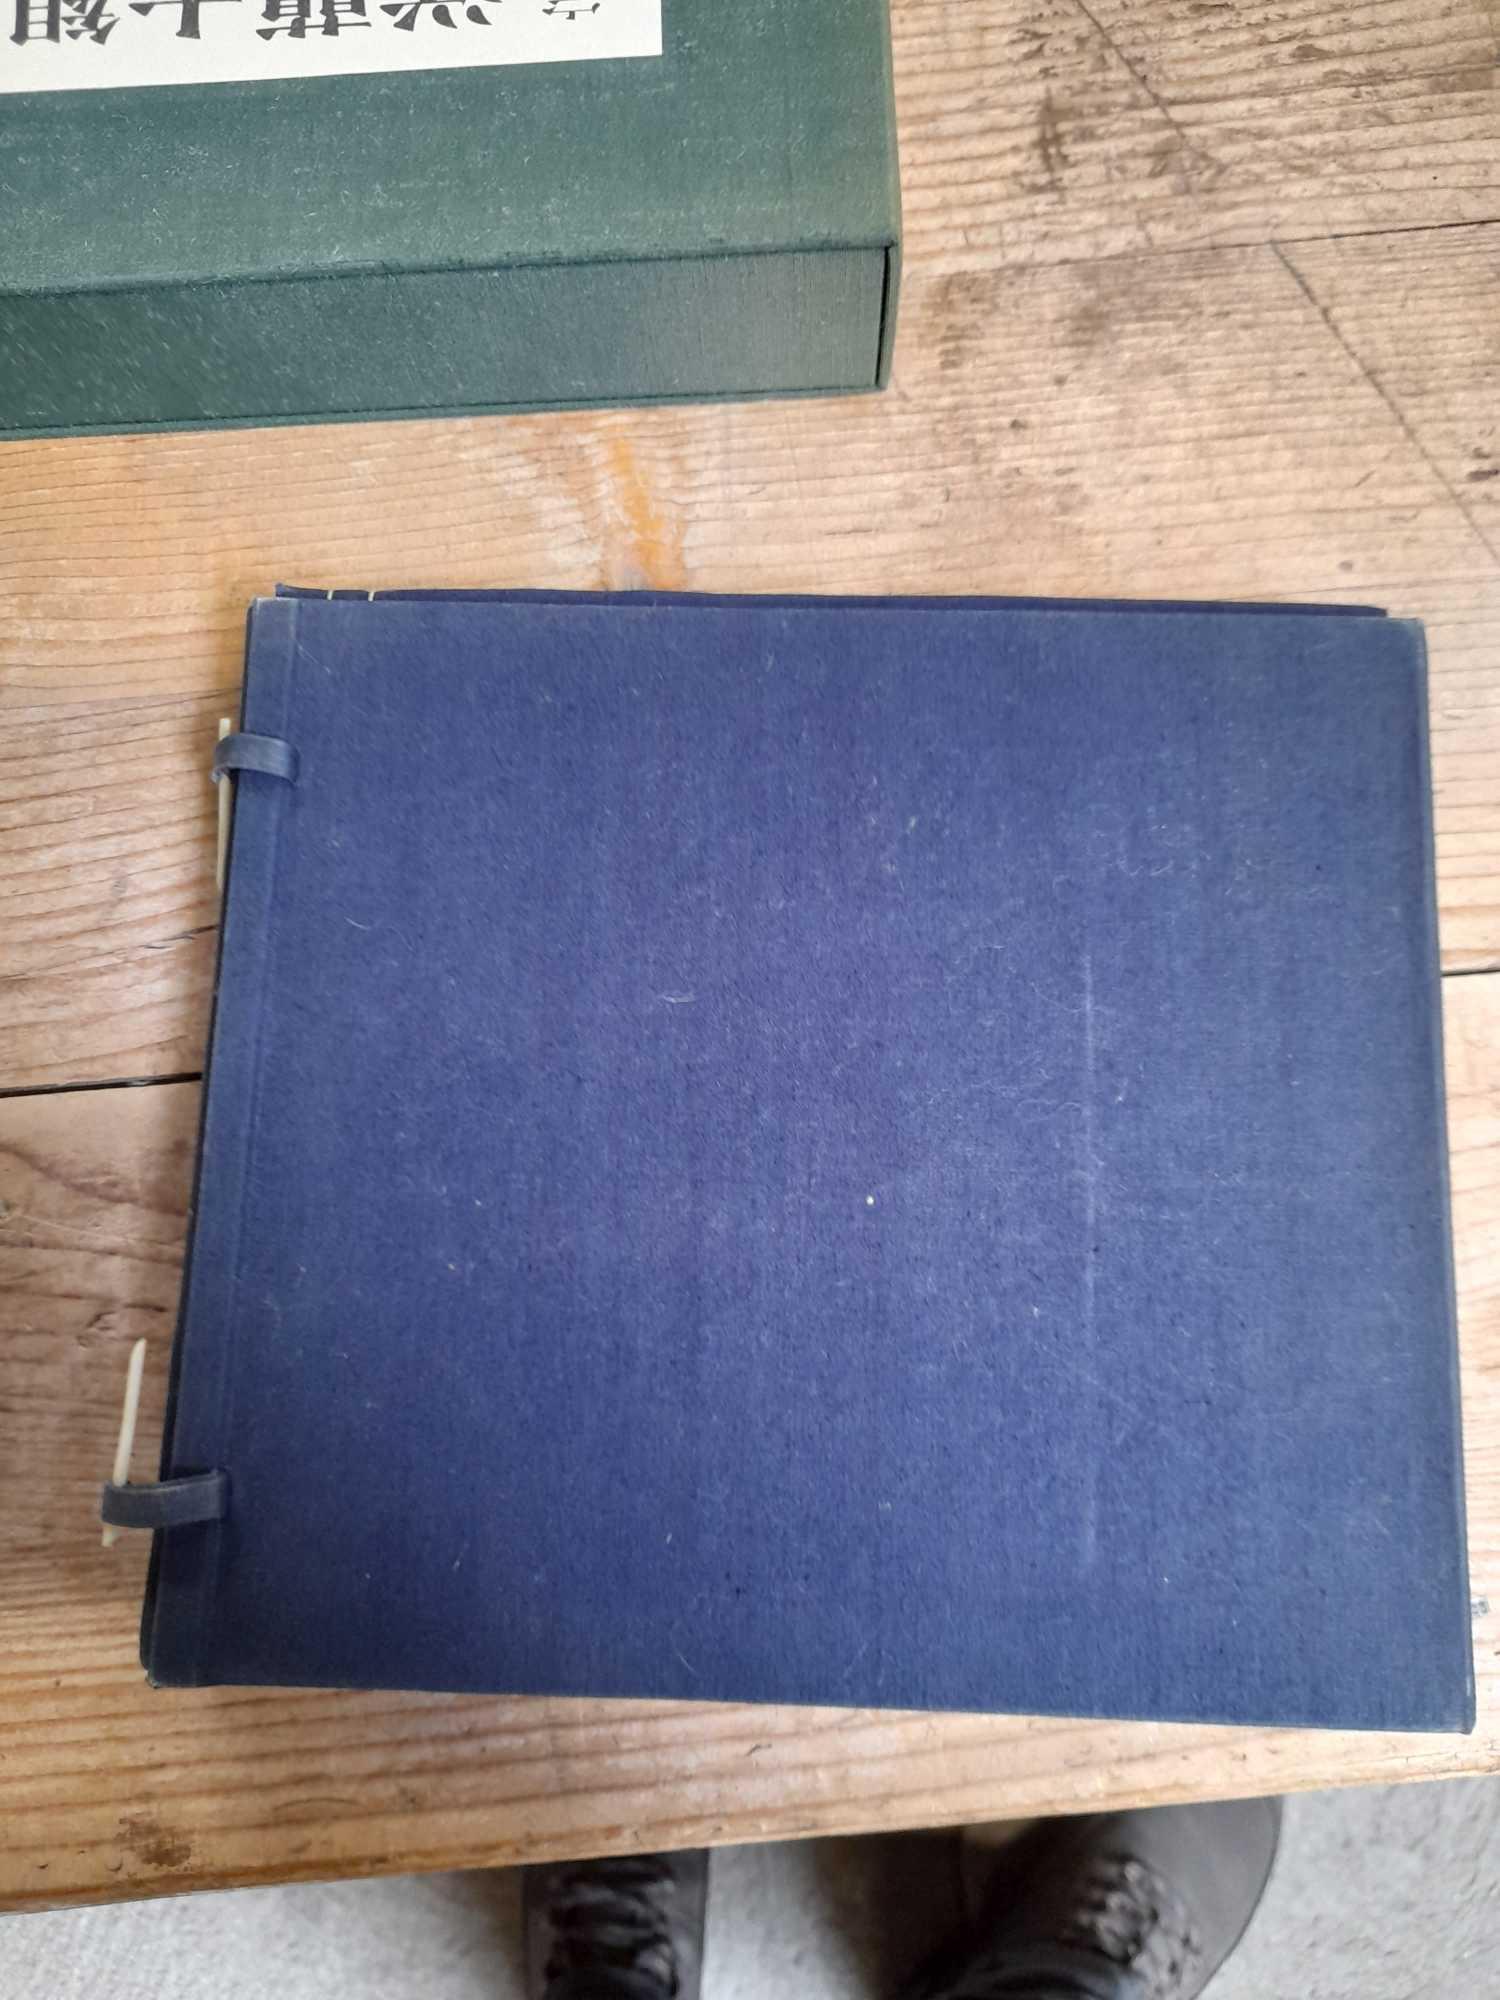 2 ORIENTAL BOOKS - Image 9 of 14